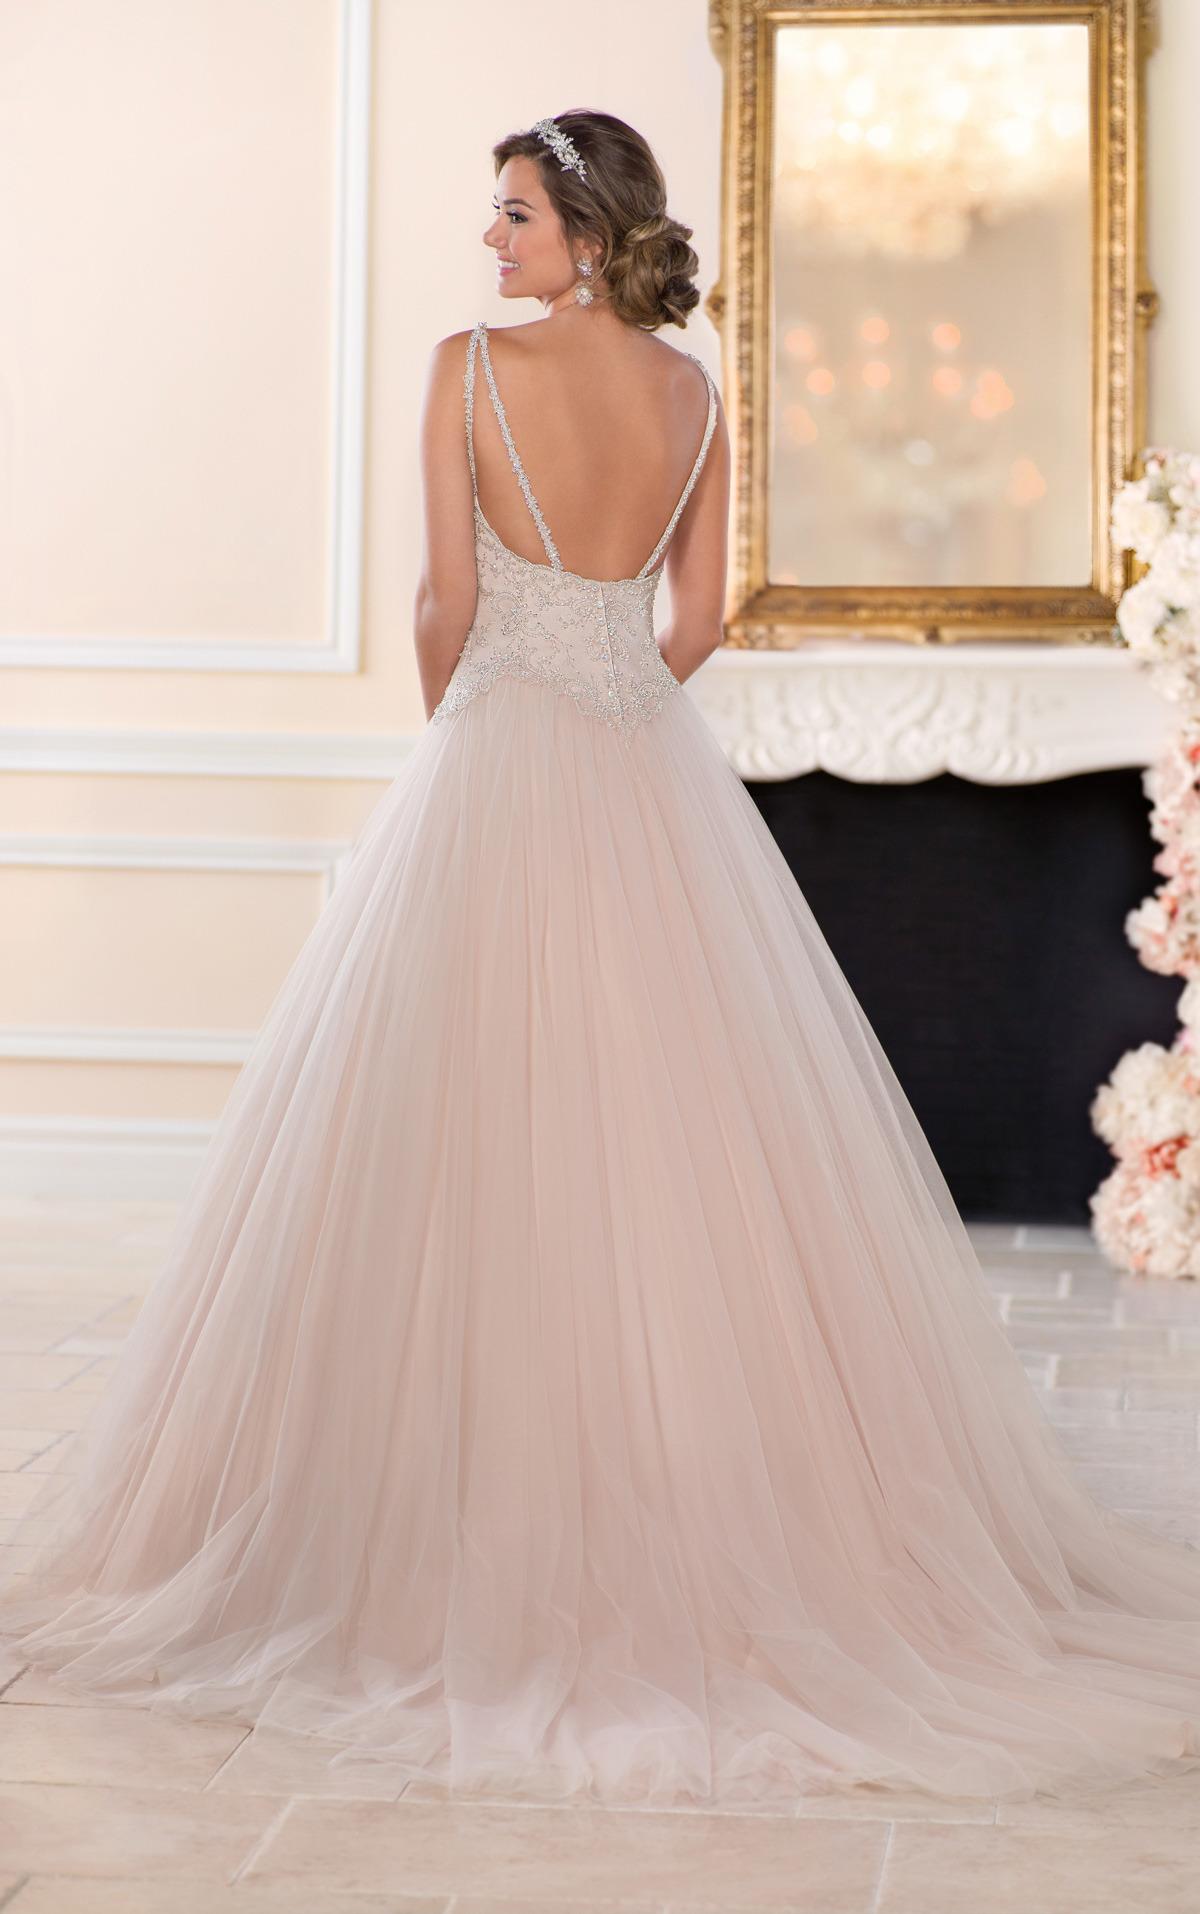 Wedding Time, Dorchester - Buy Wedding Clothes